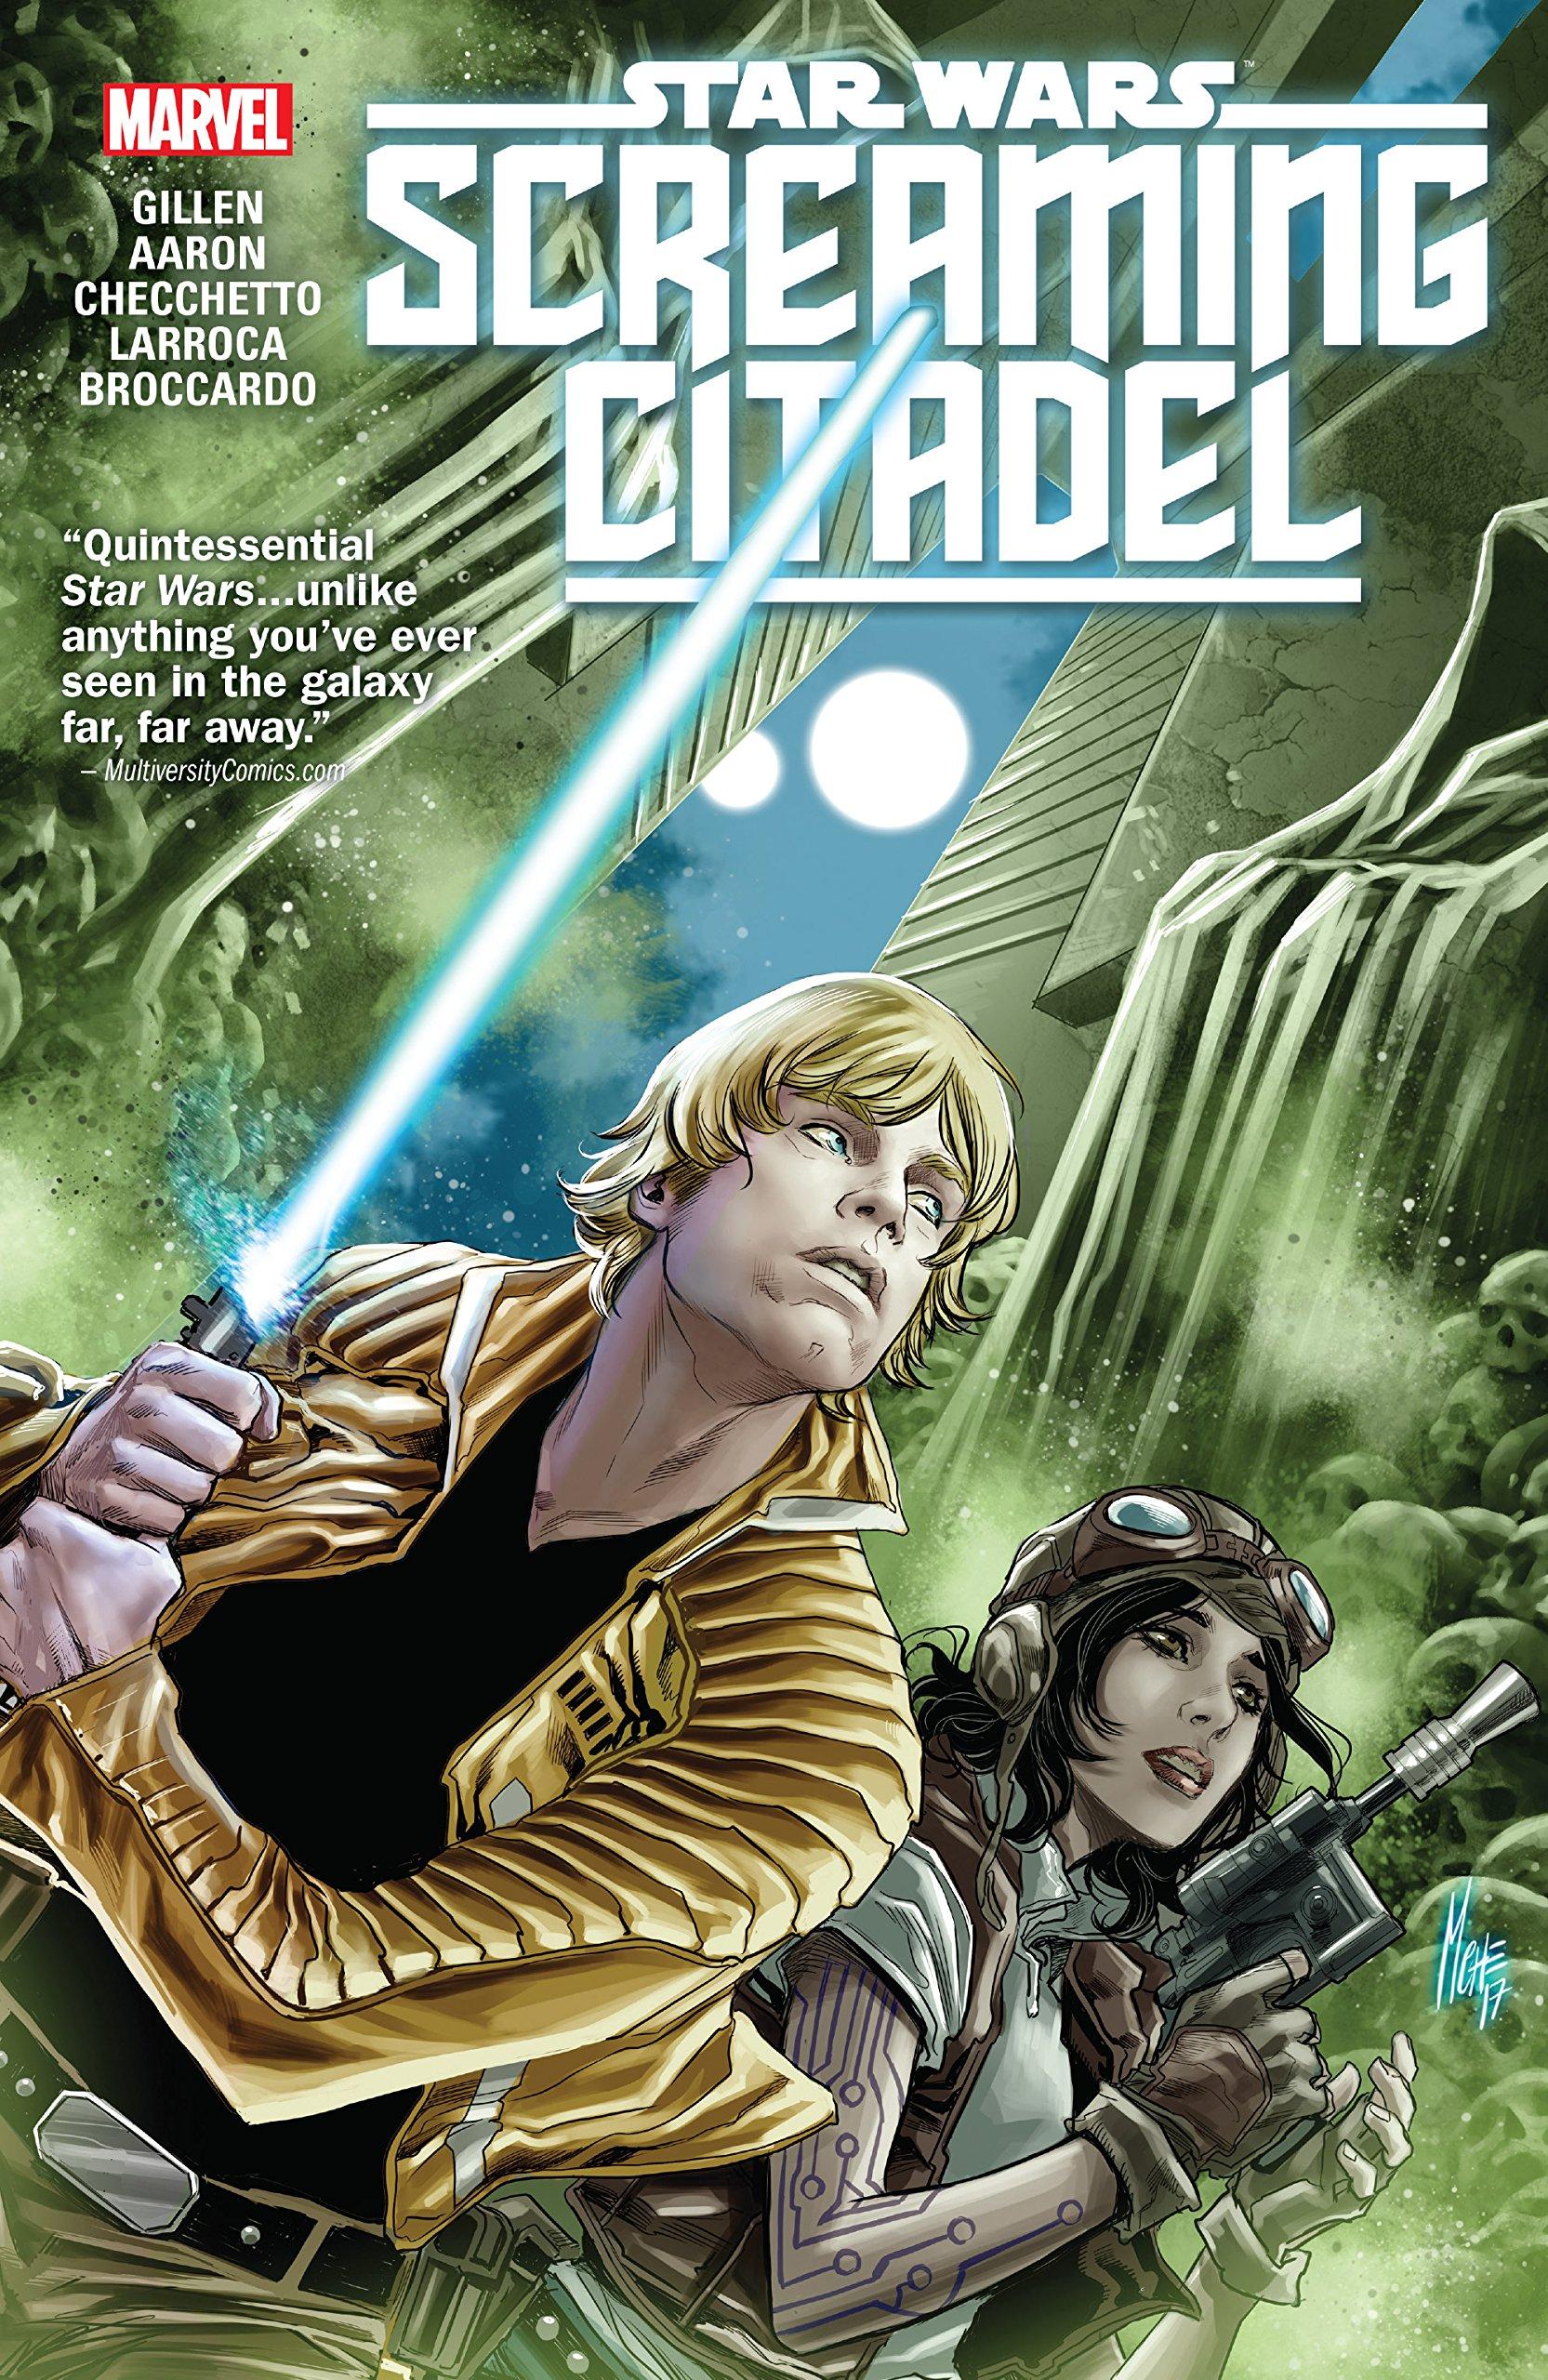 Star Wars  The Screaming Citadel  Star Wars  The Screaming Citadel  2017    English Edition